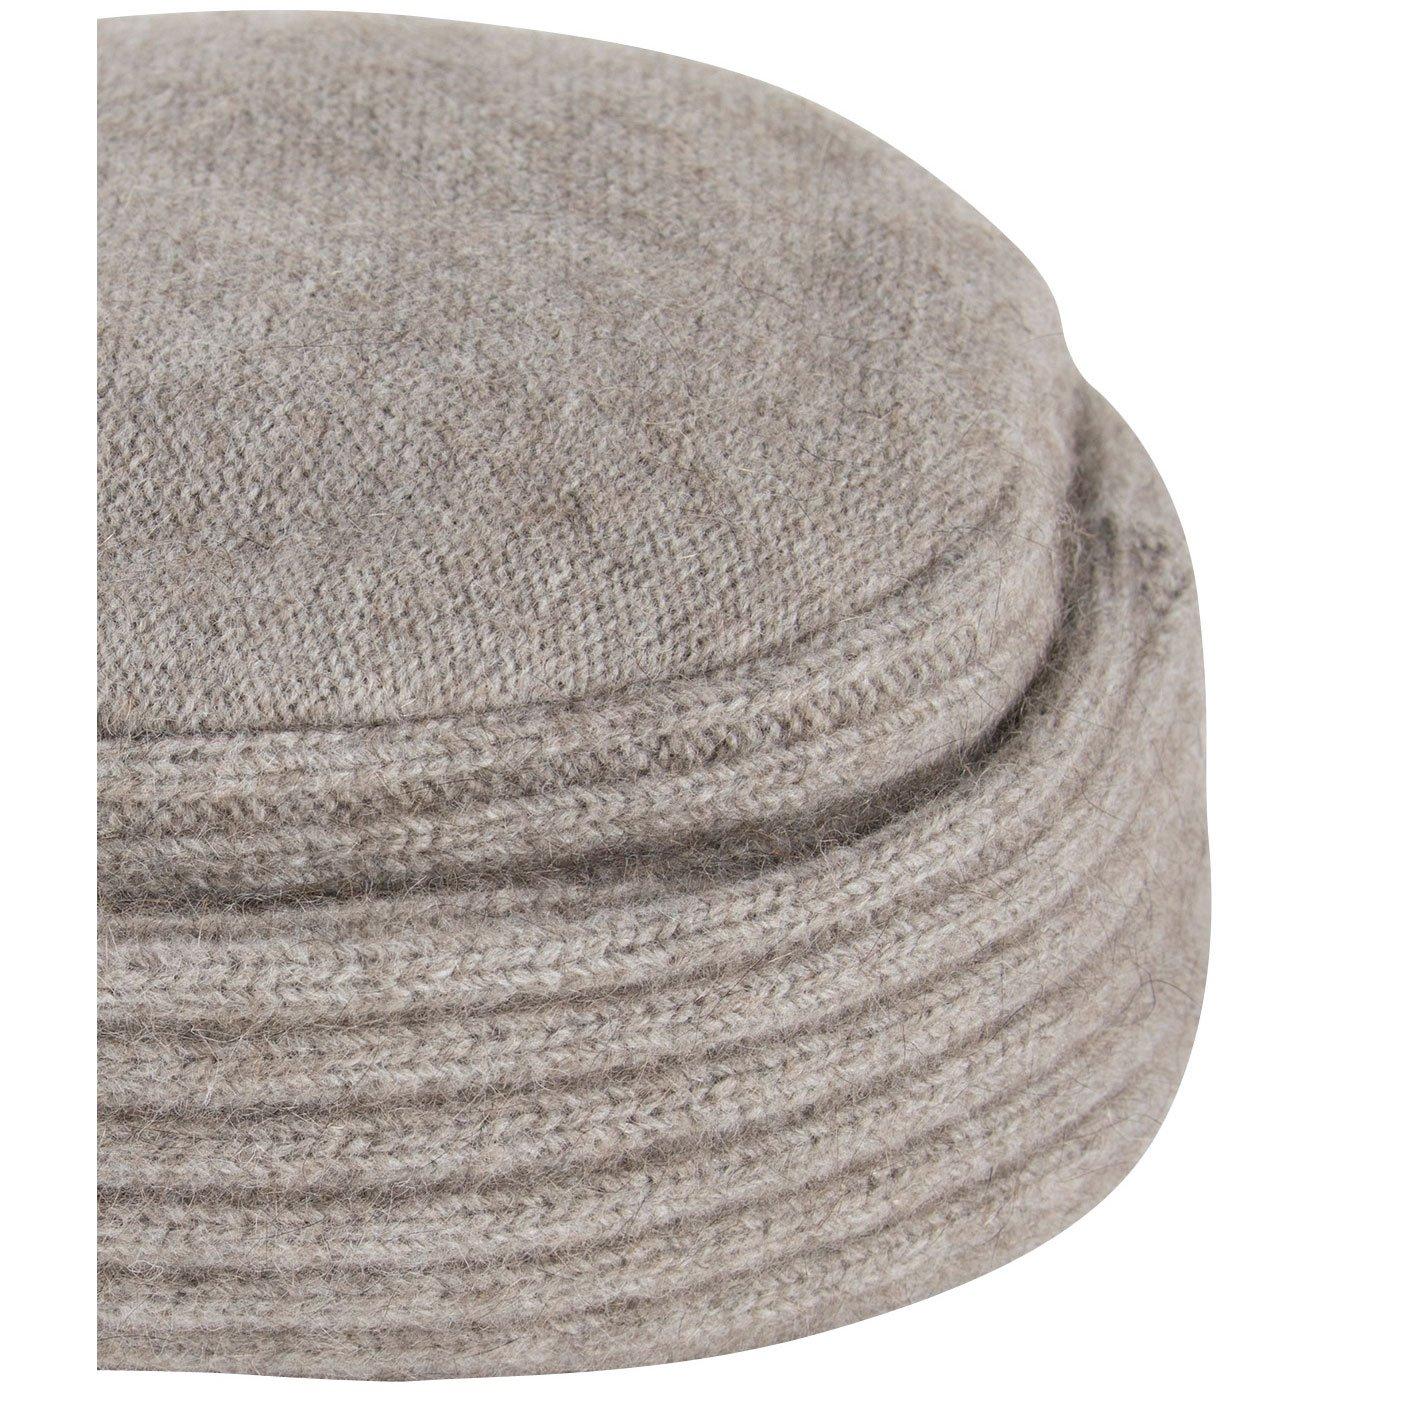 Merinomink Felted Hat, Merino Possum Blend, Stone by Merinomink (Image #3)